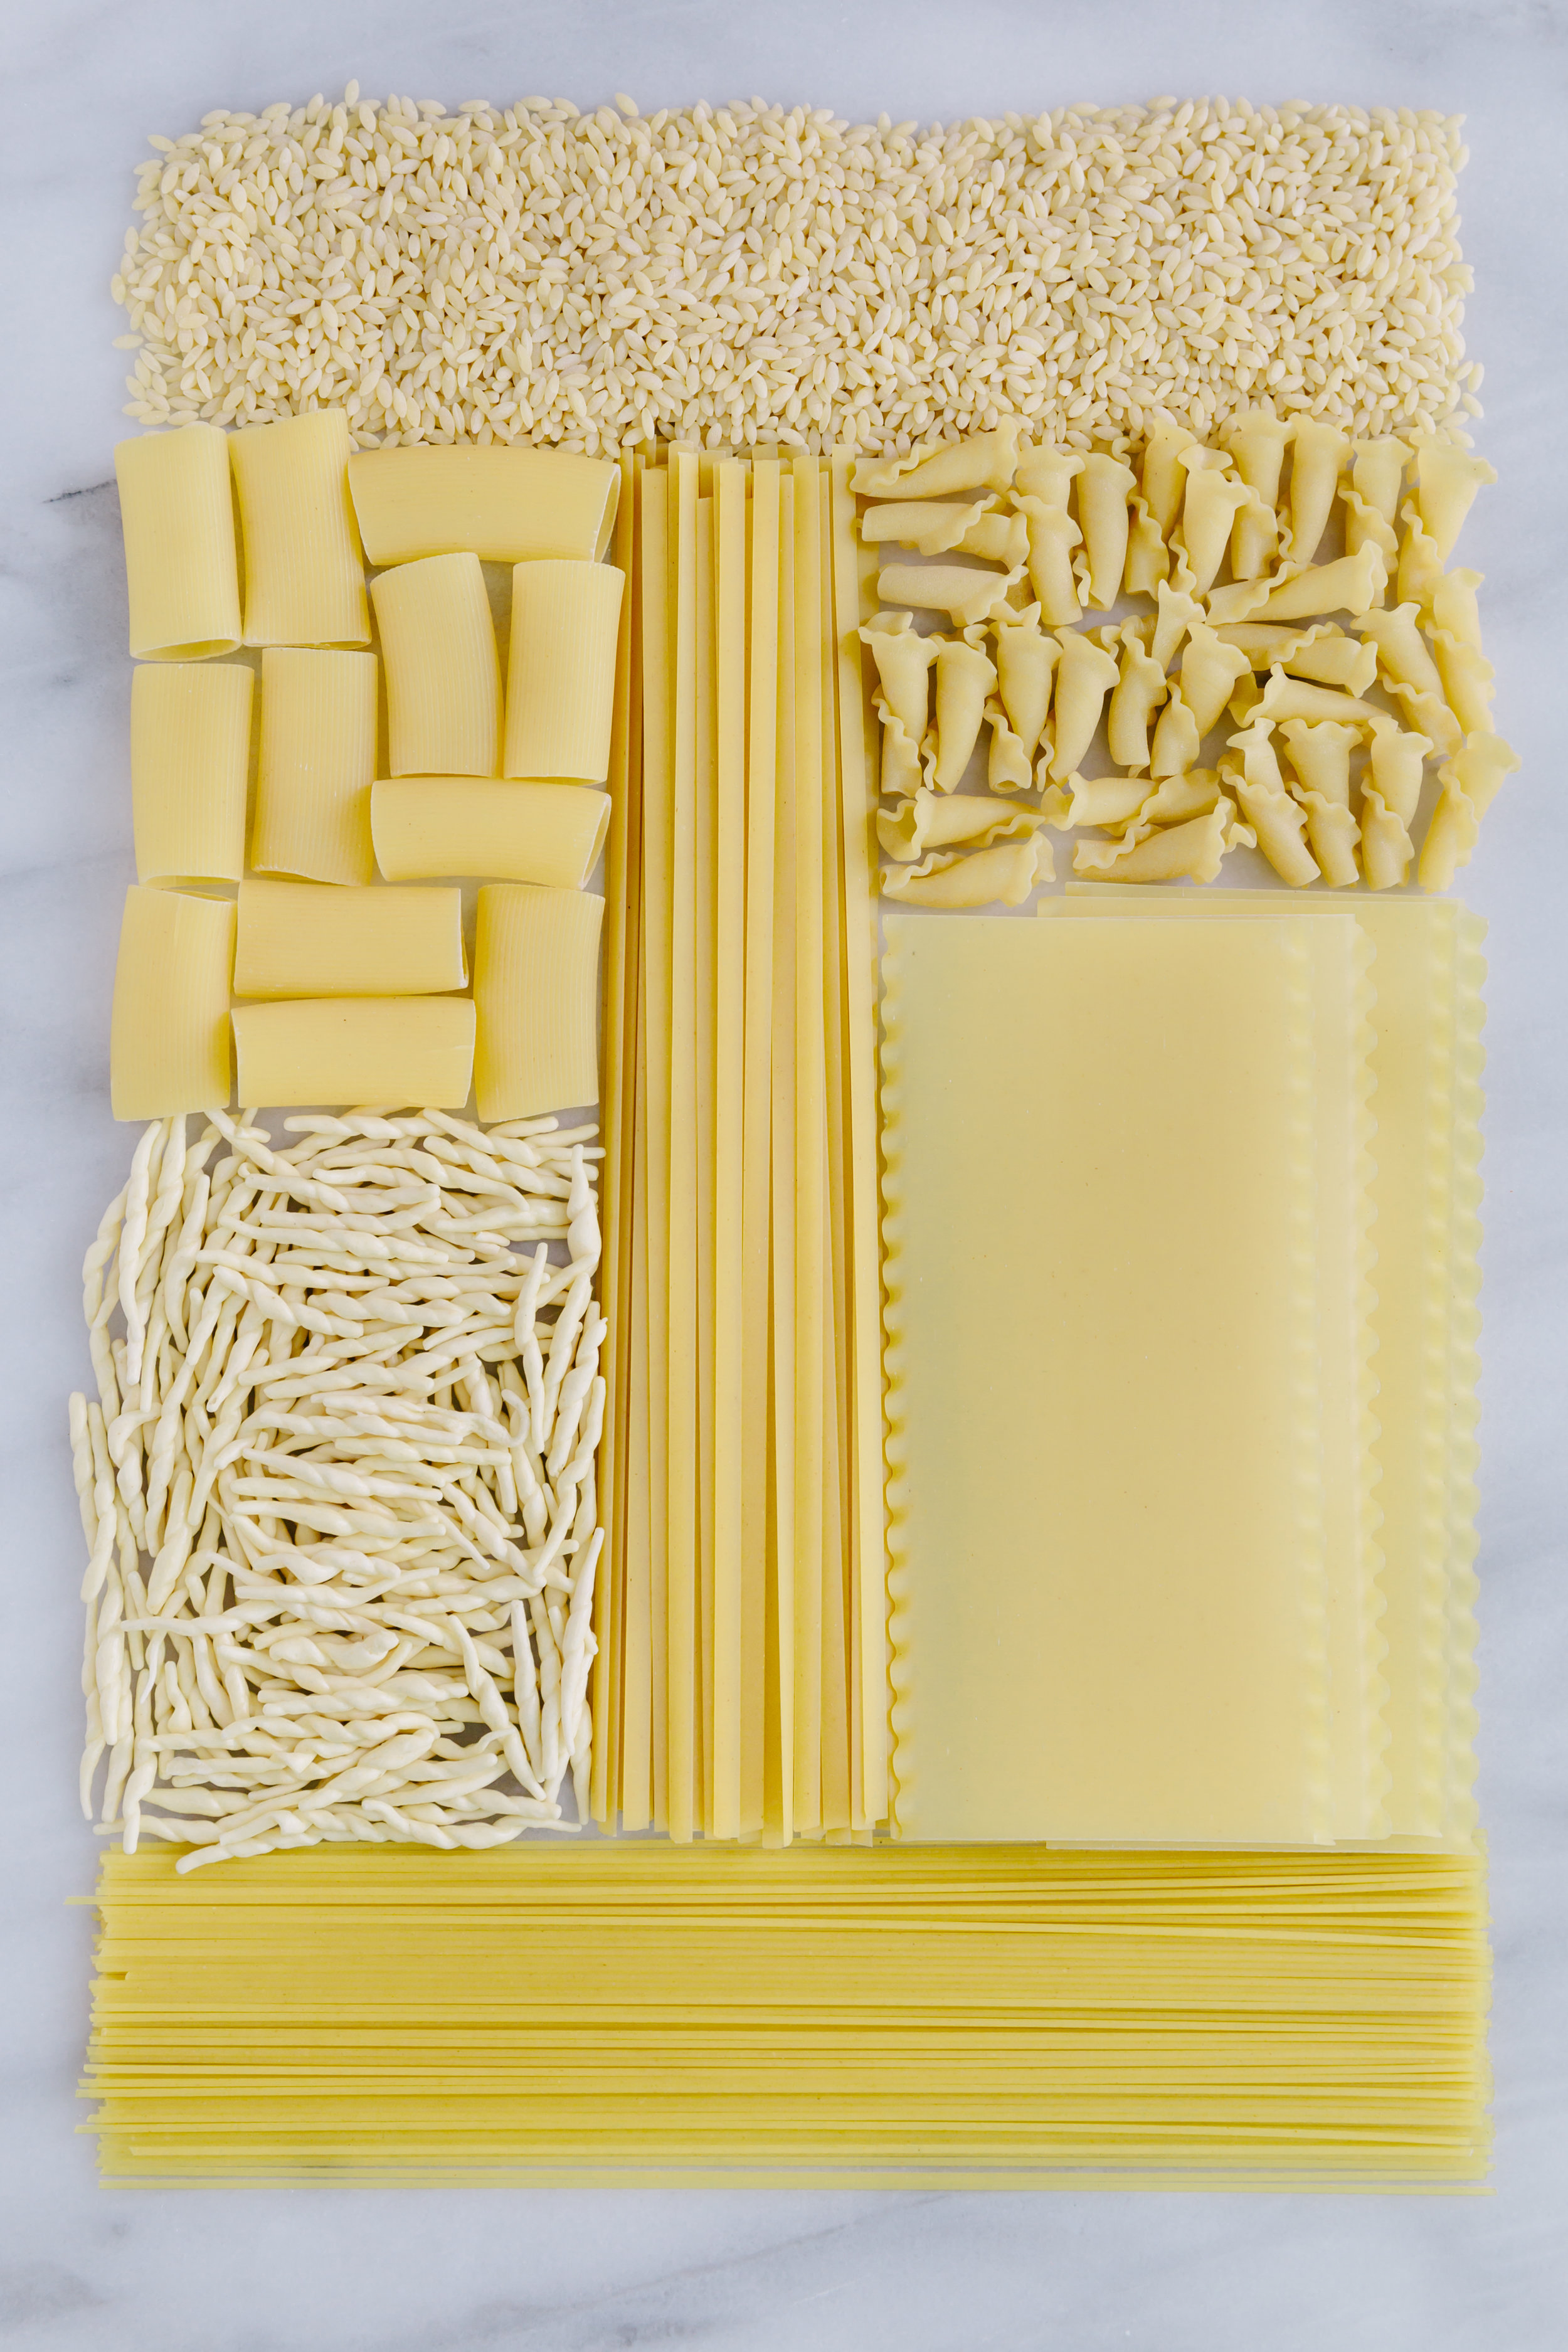 types of pasta-7954.jpg